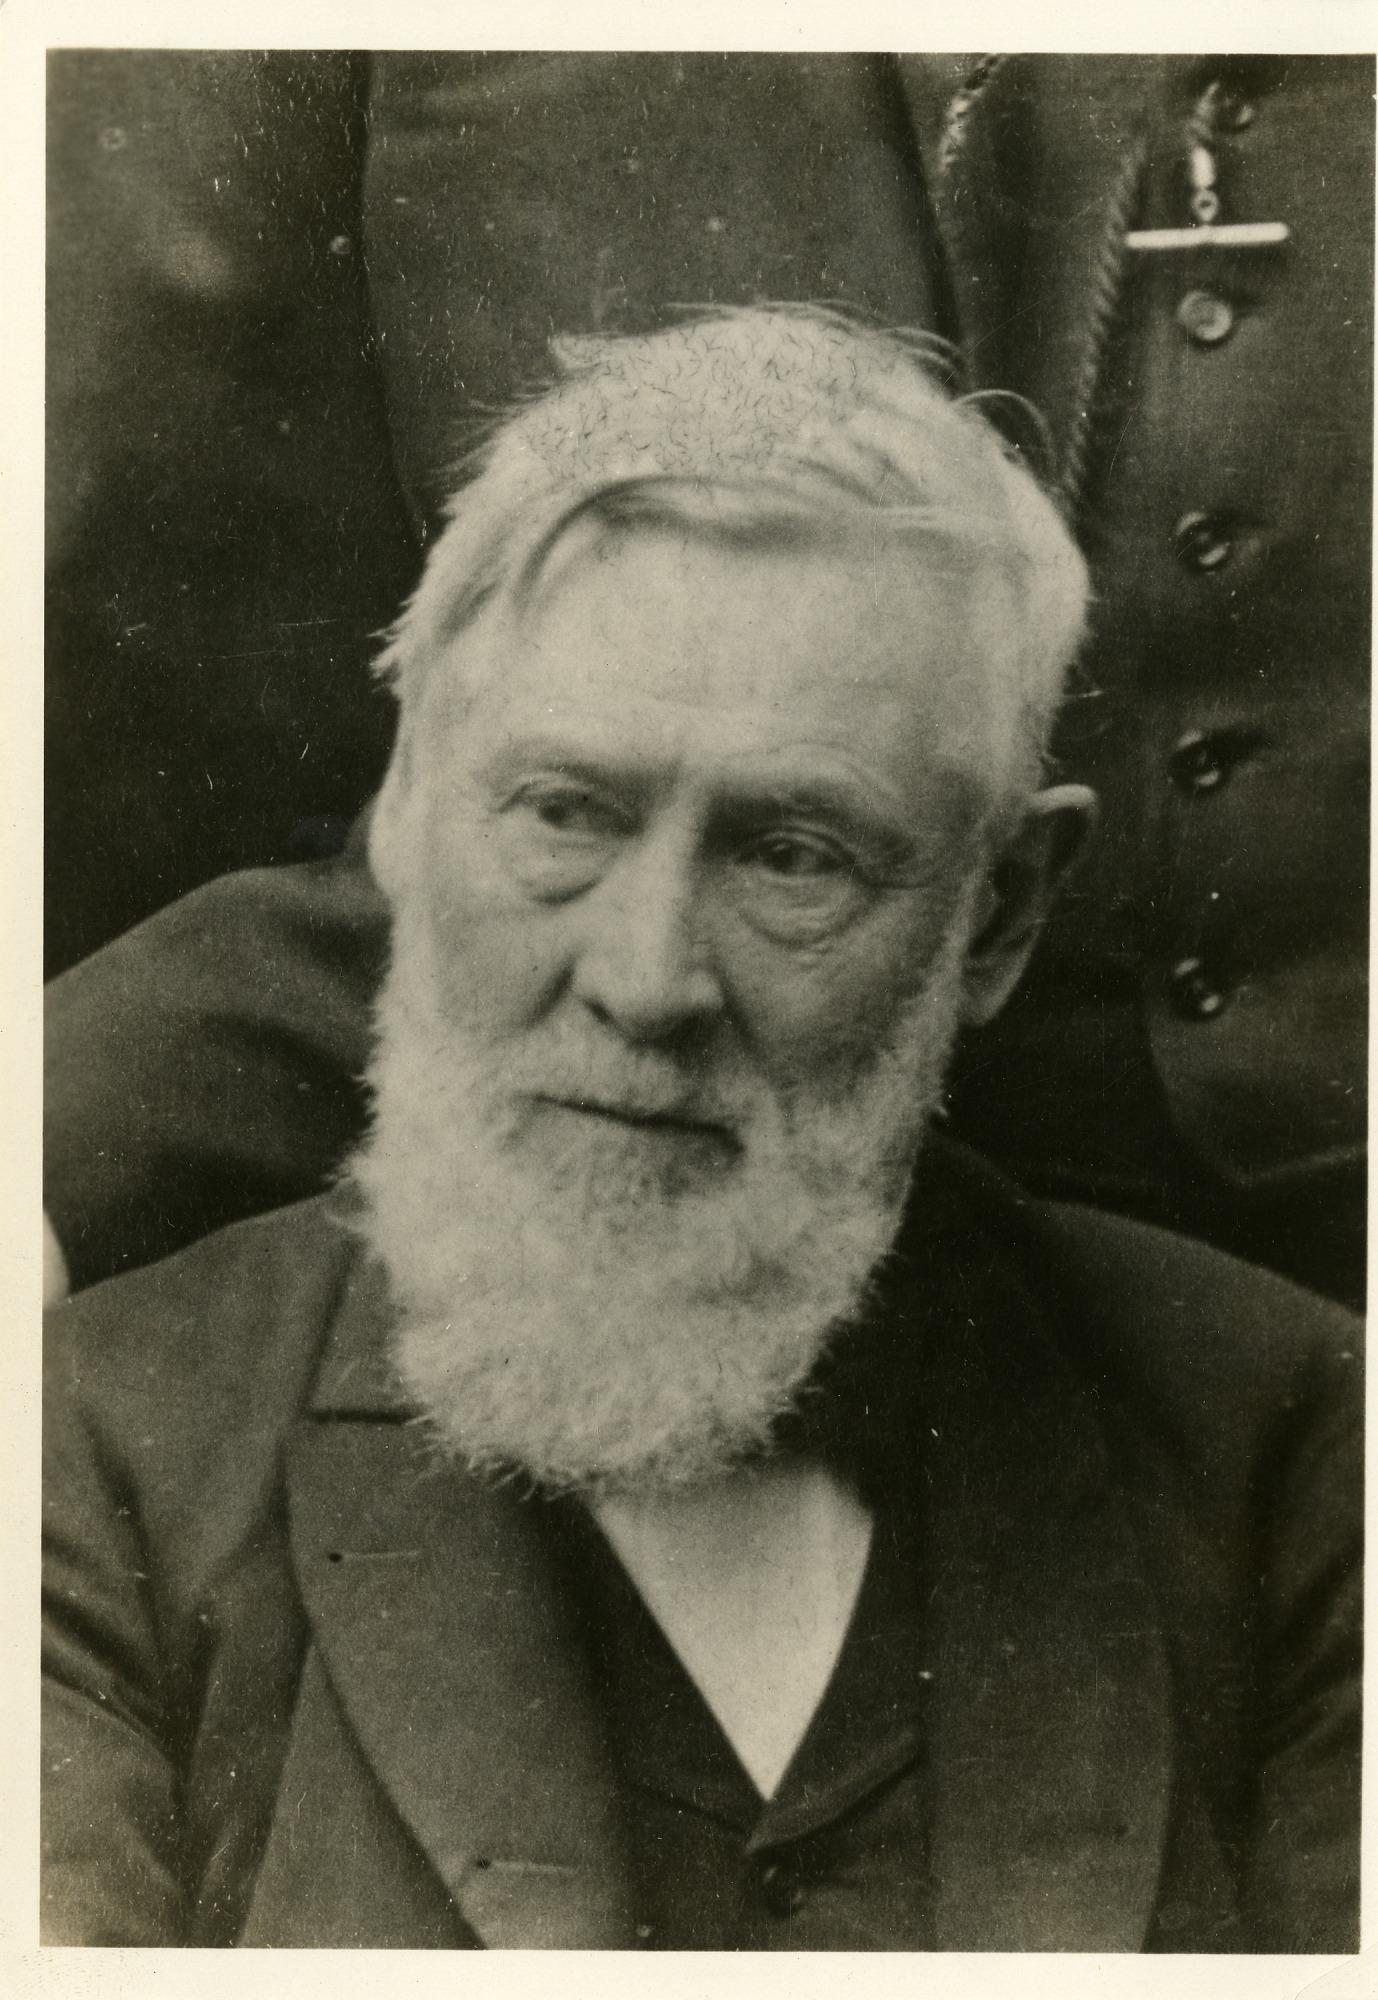 Asa Gray (1810-1888), 1886, Smithsonian Institution Archives, SIA Acc. 90-105 [SIA2008-2056].